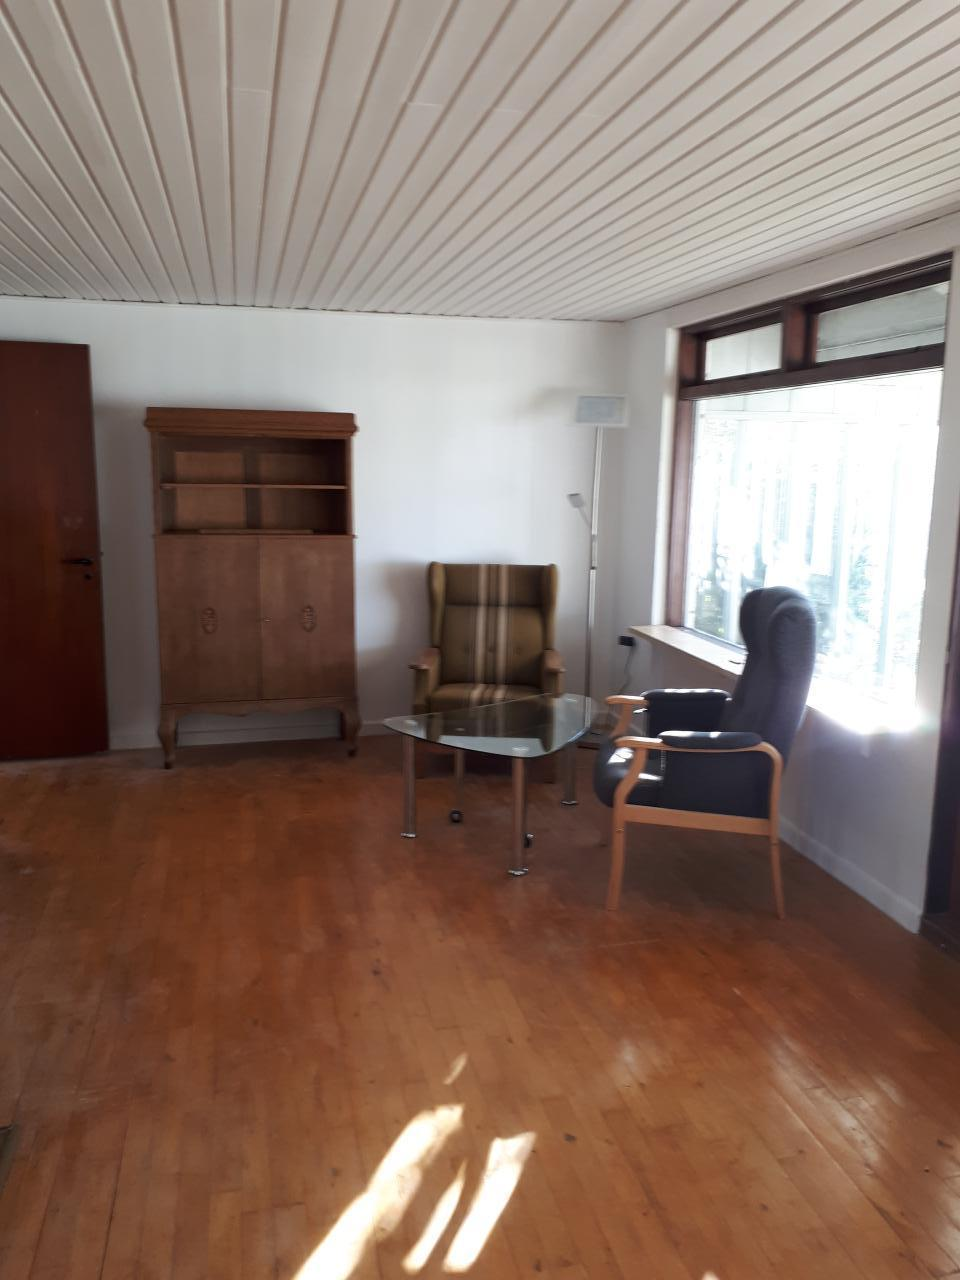 Ferienhaus Tklhus Aeroe (2549744), Ærøskøbing, , Ærø, Dänemark, Bild 5